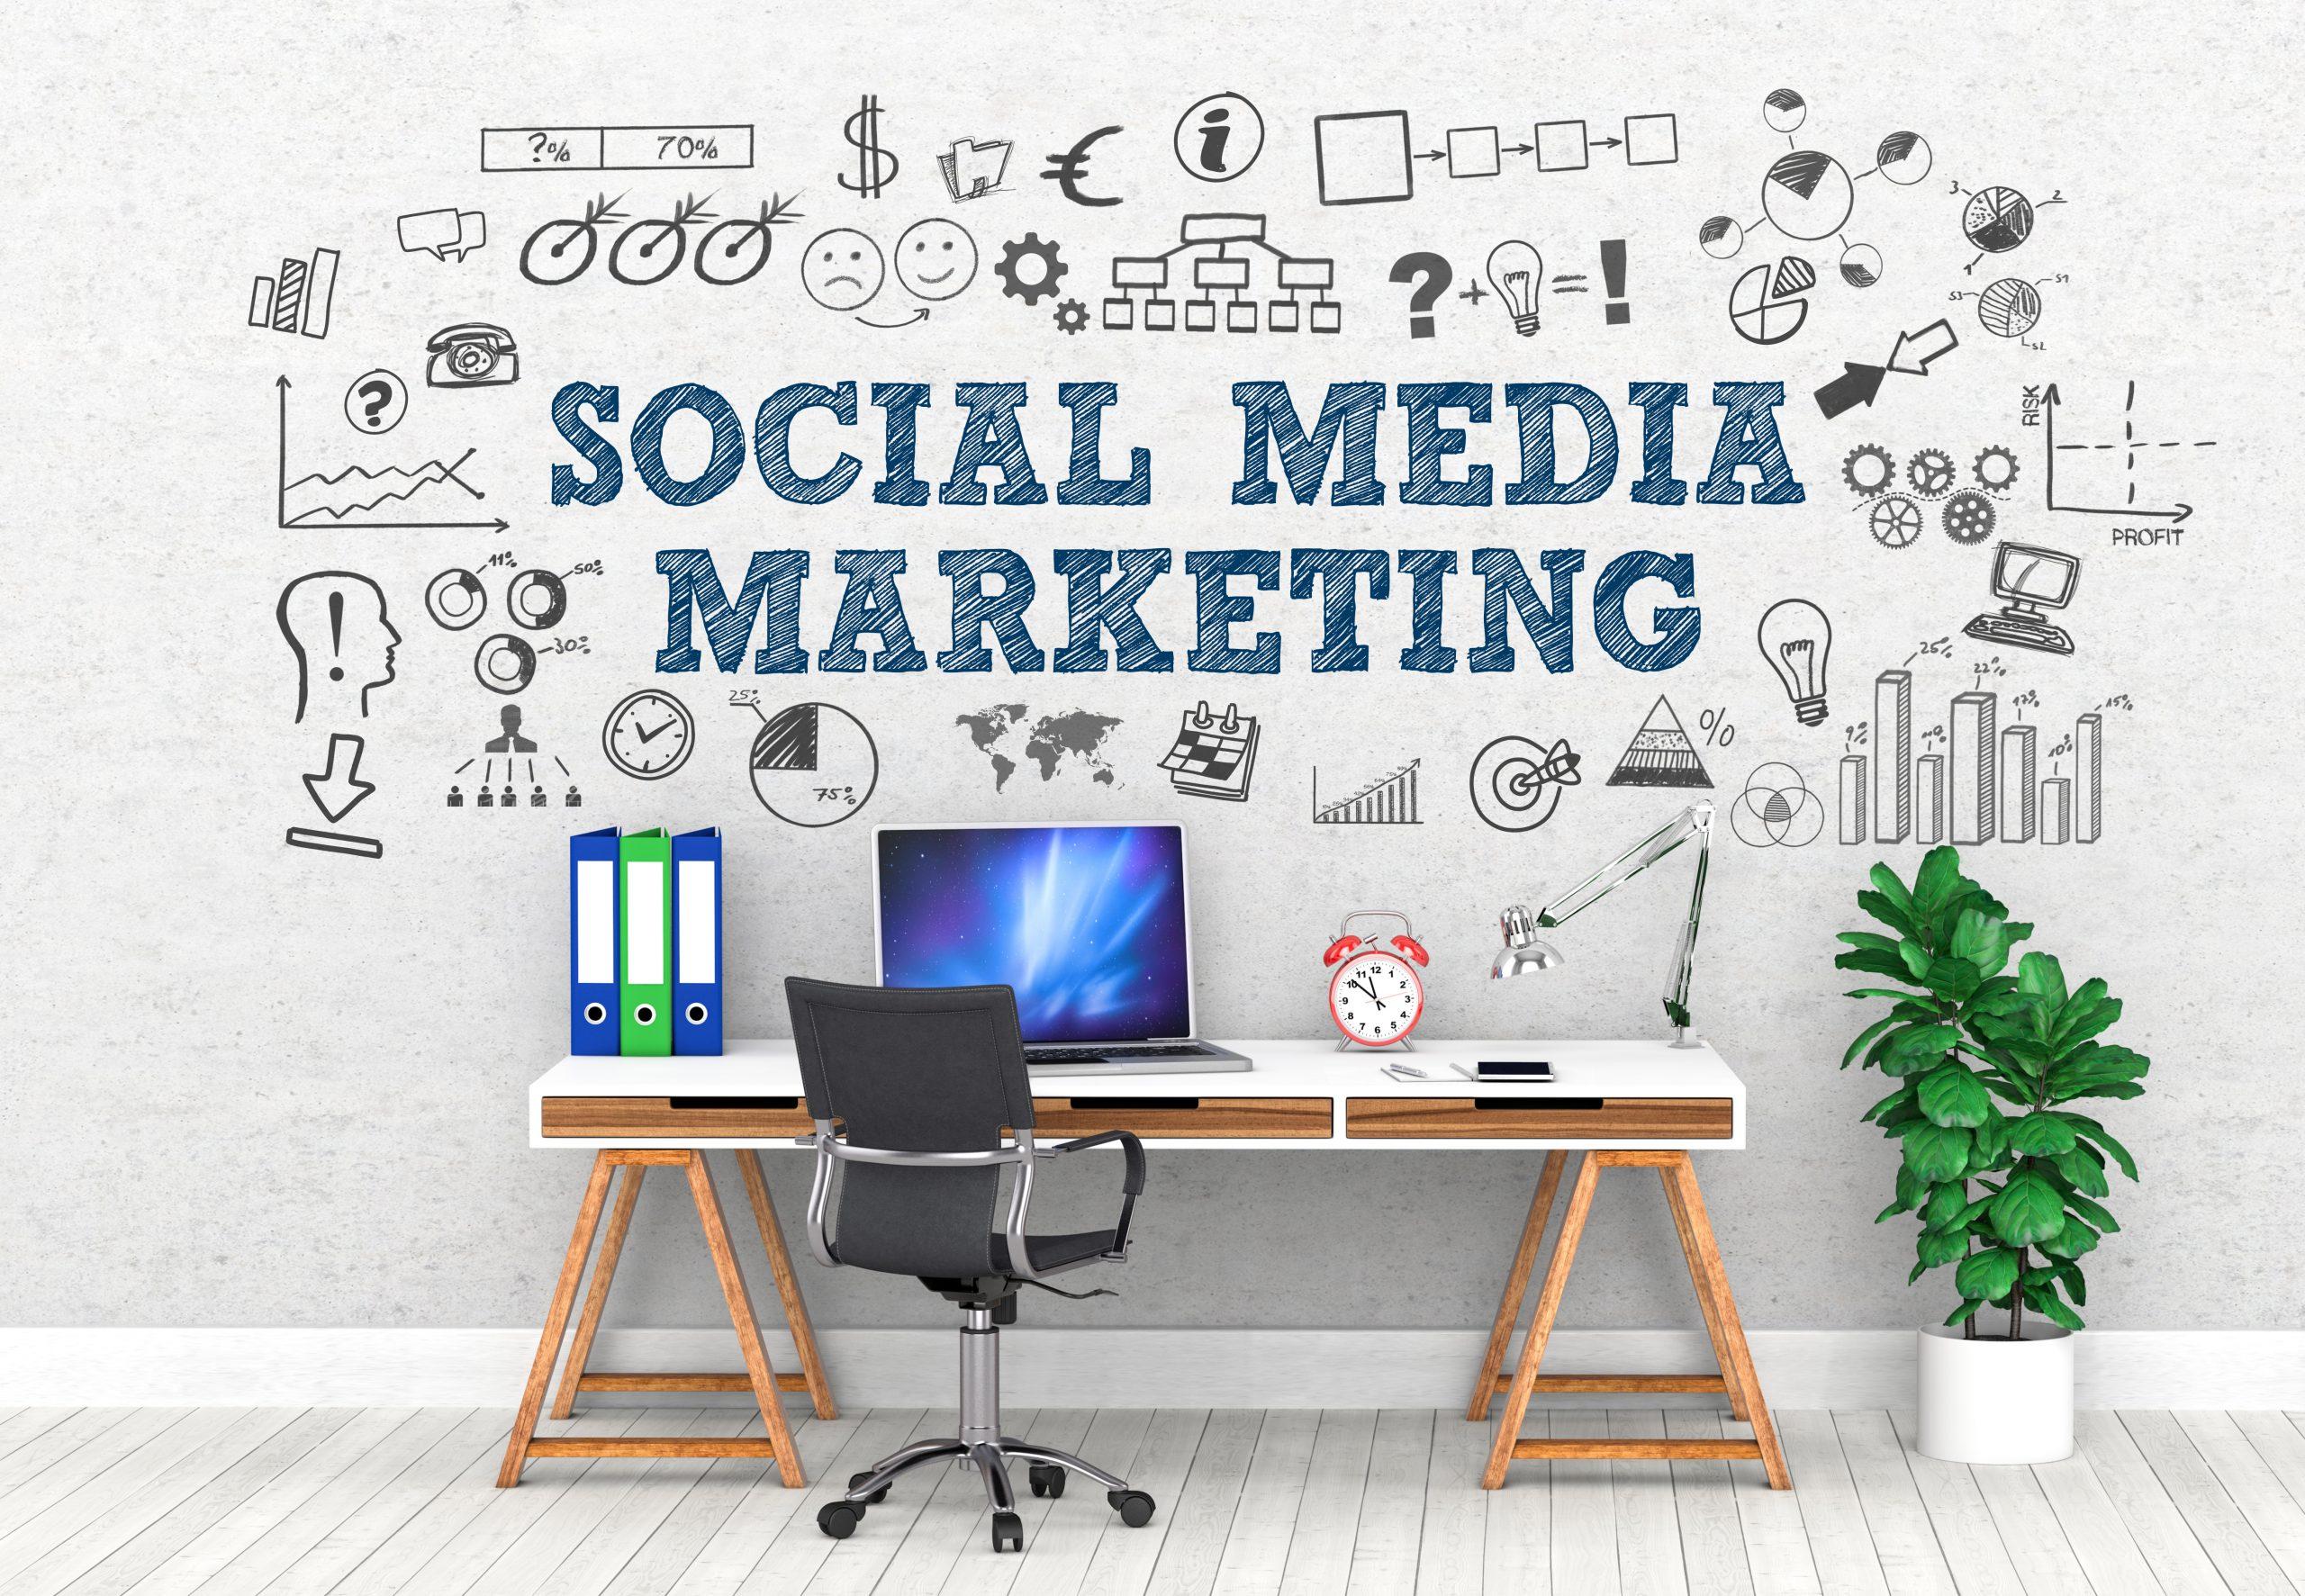 A day in social media marketing world